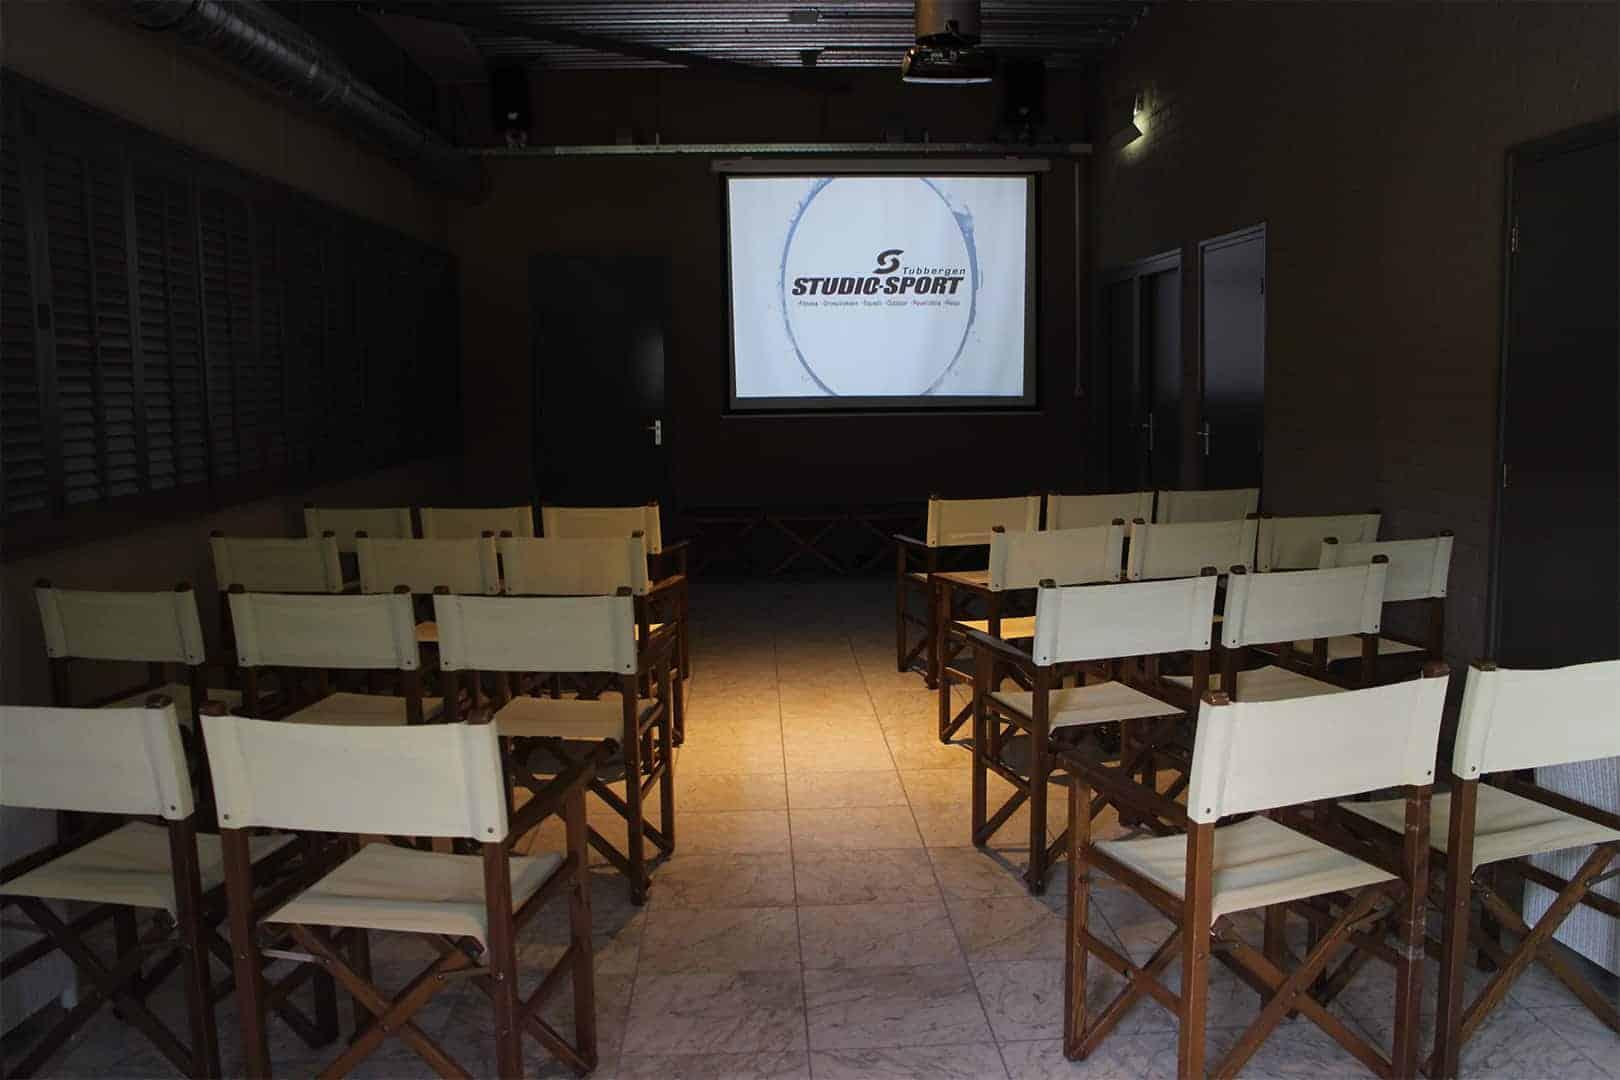 Presentatieruimte Studiosport Tubbergen 172